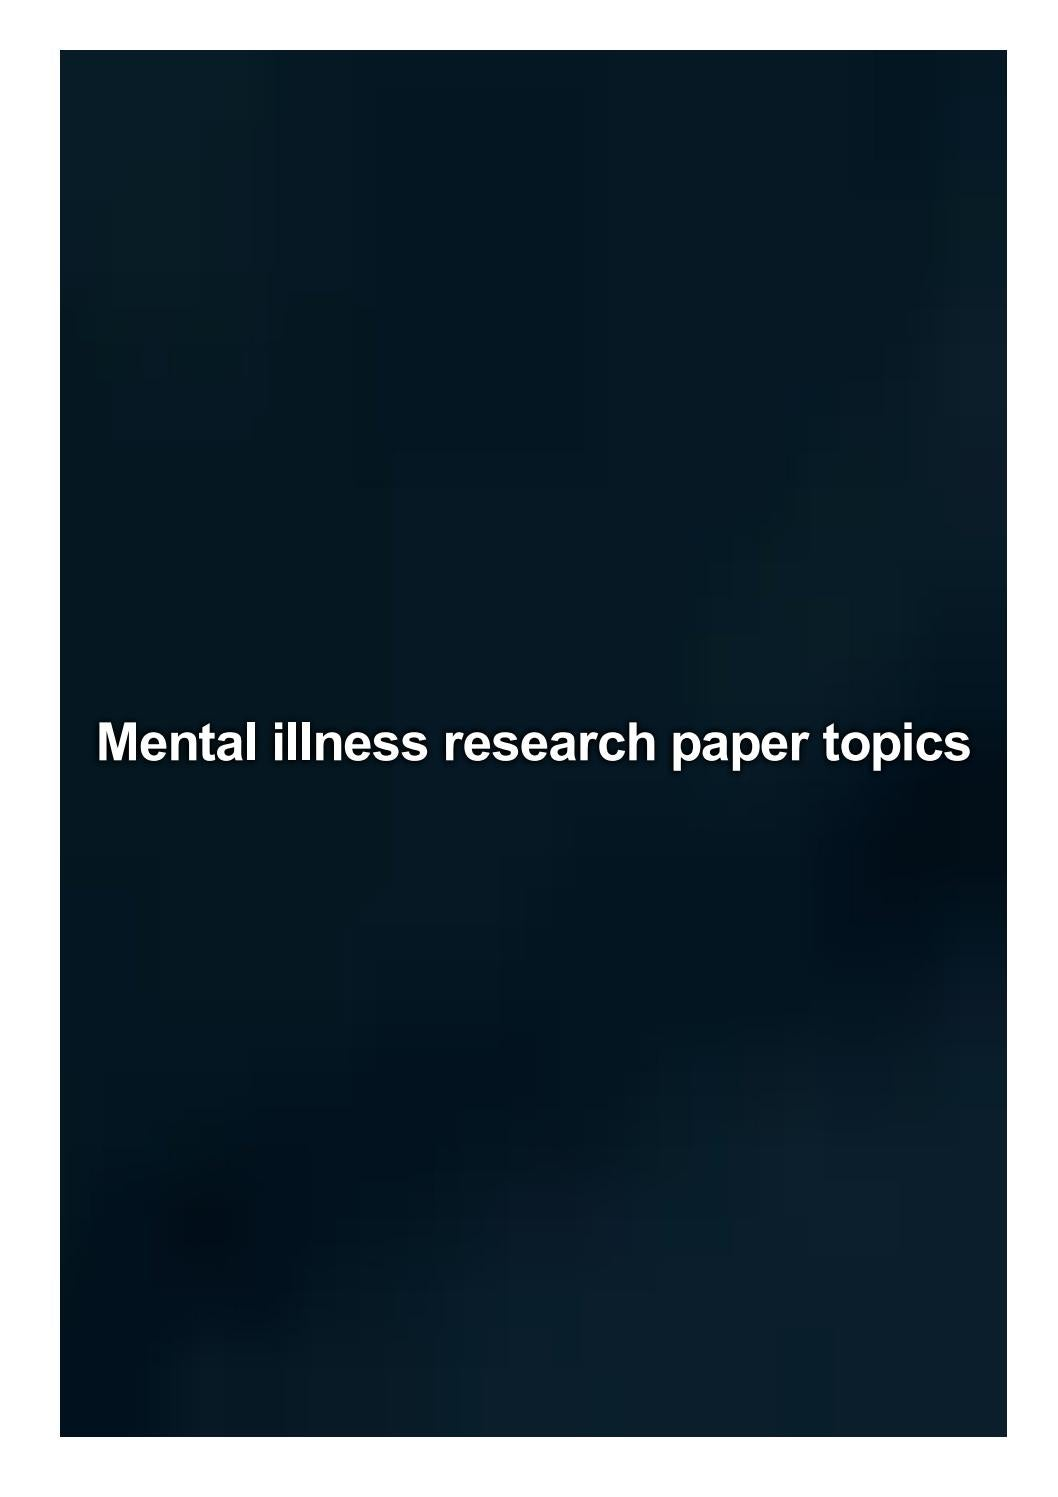 Mental illness research paper topics essay elementary